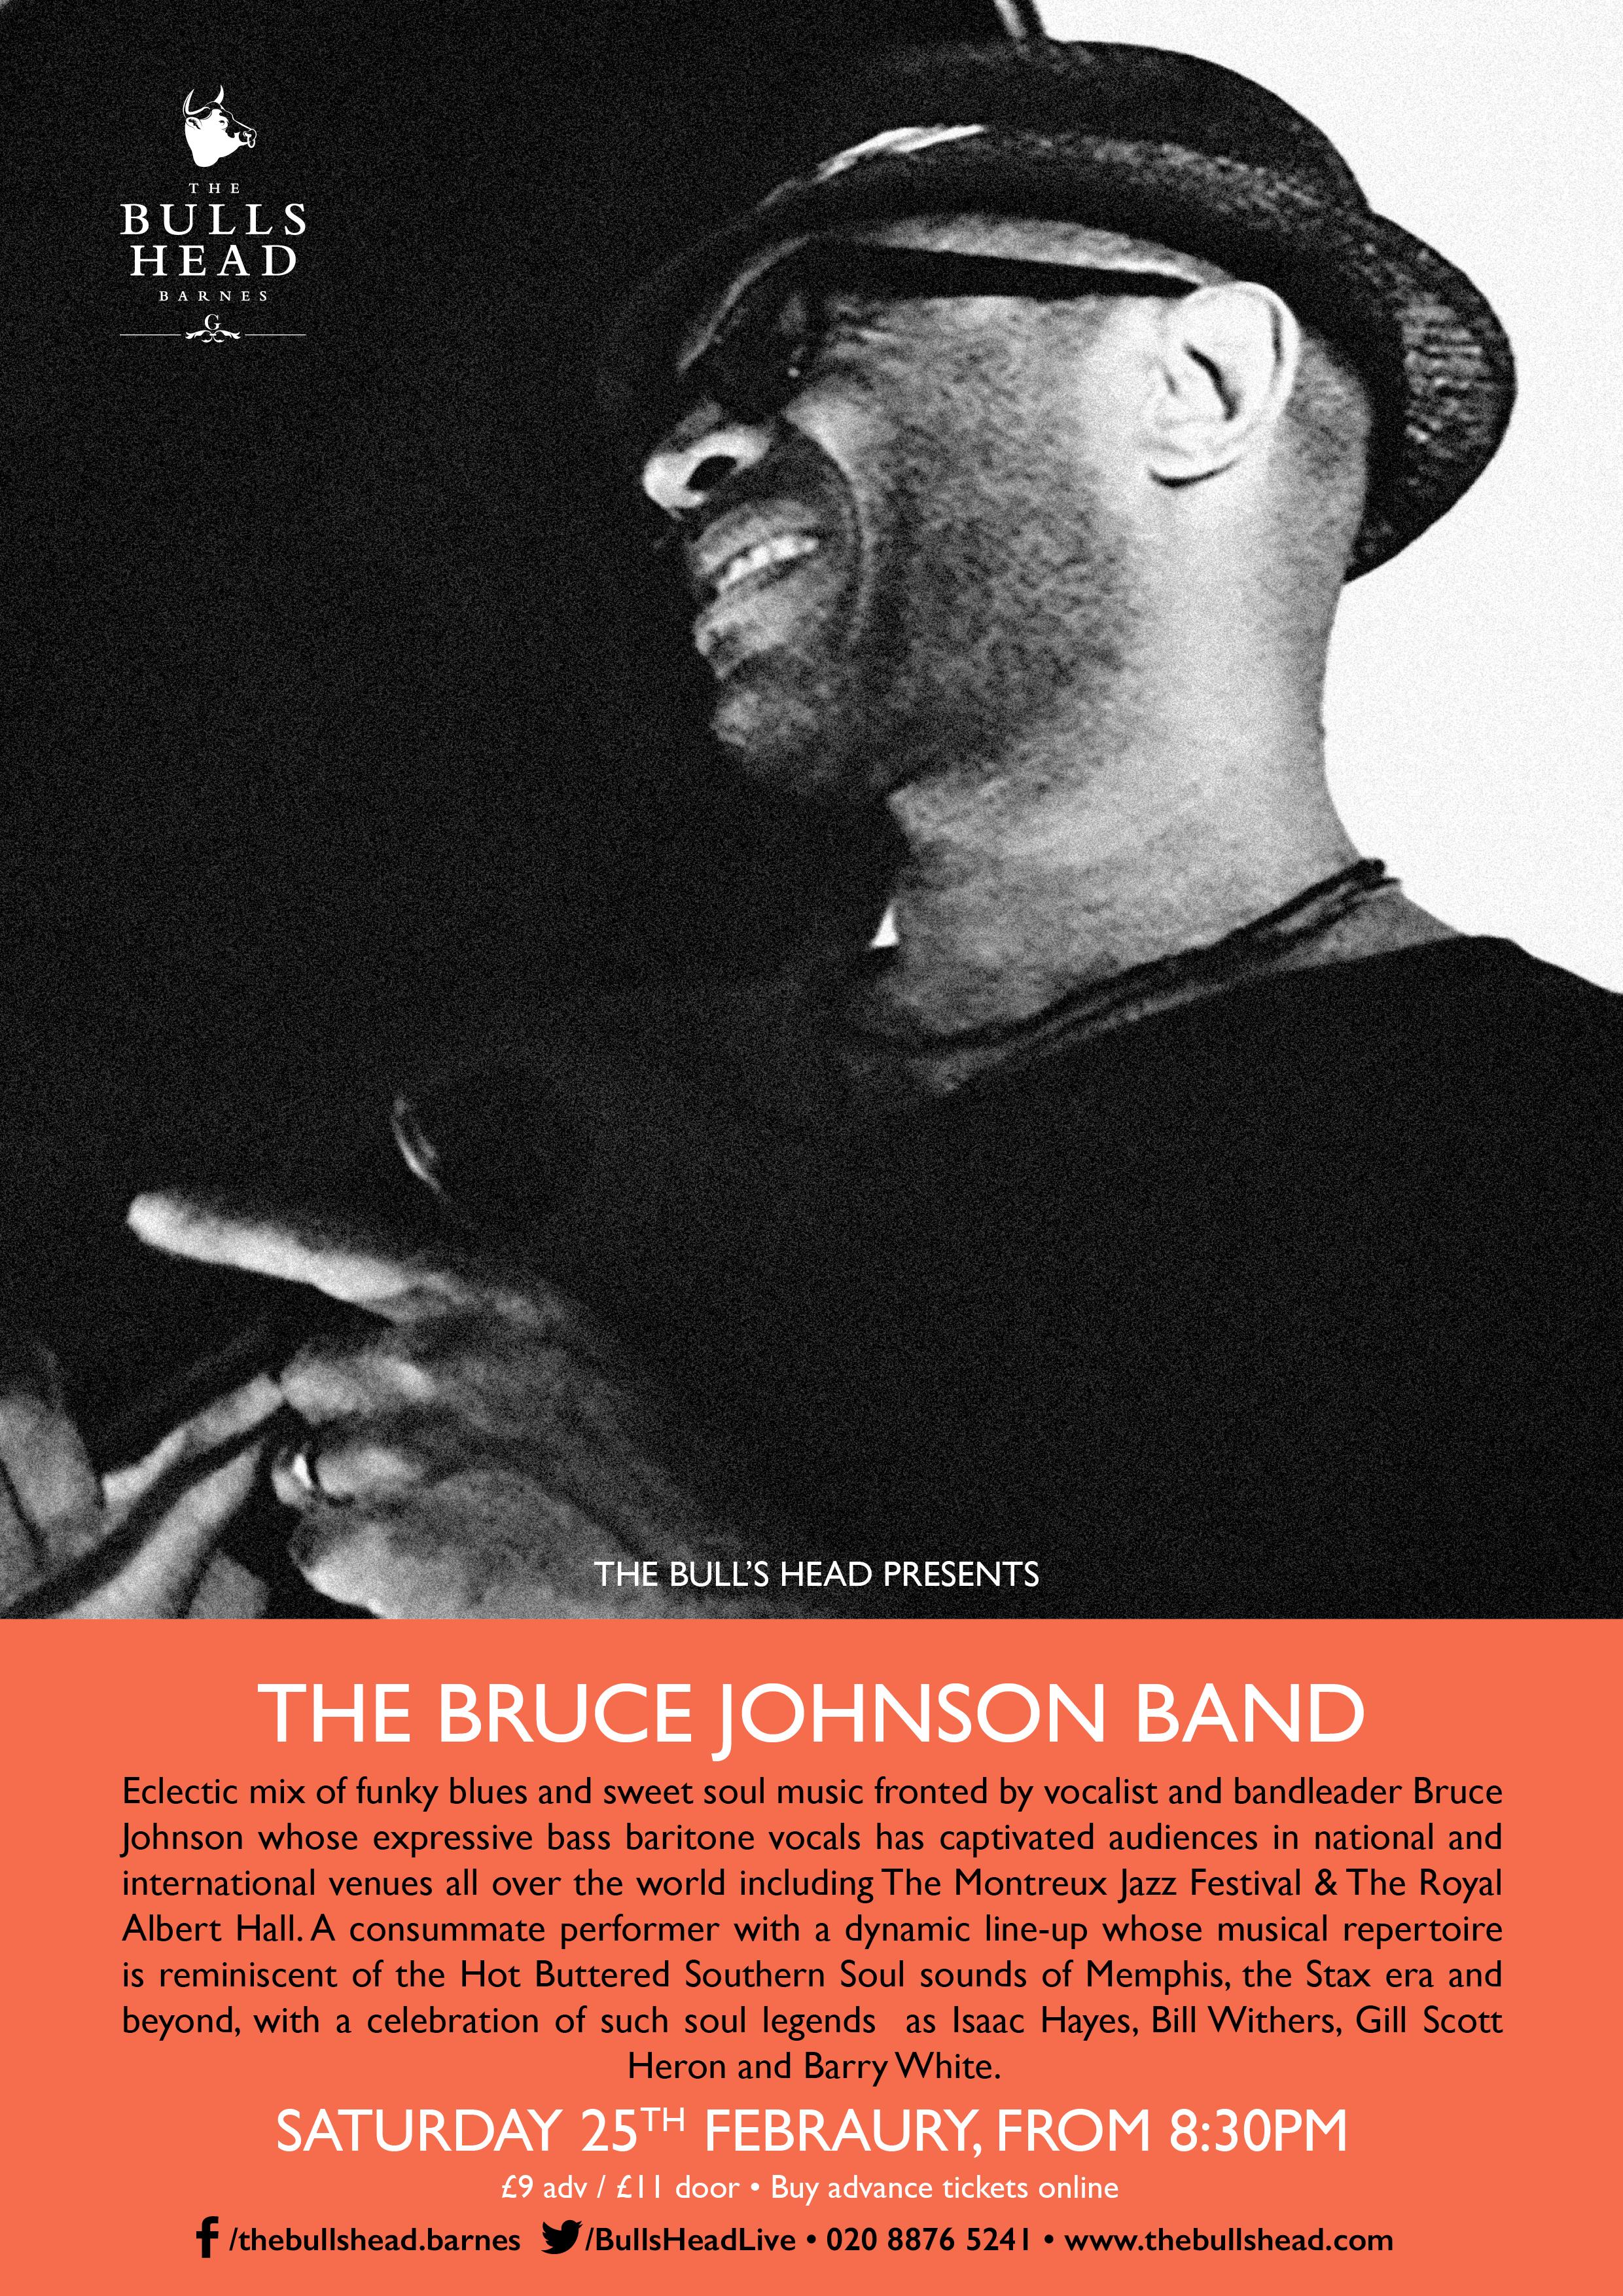 The Bruce 'Mississippi' Johnson Band